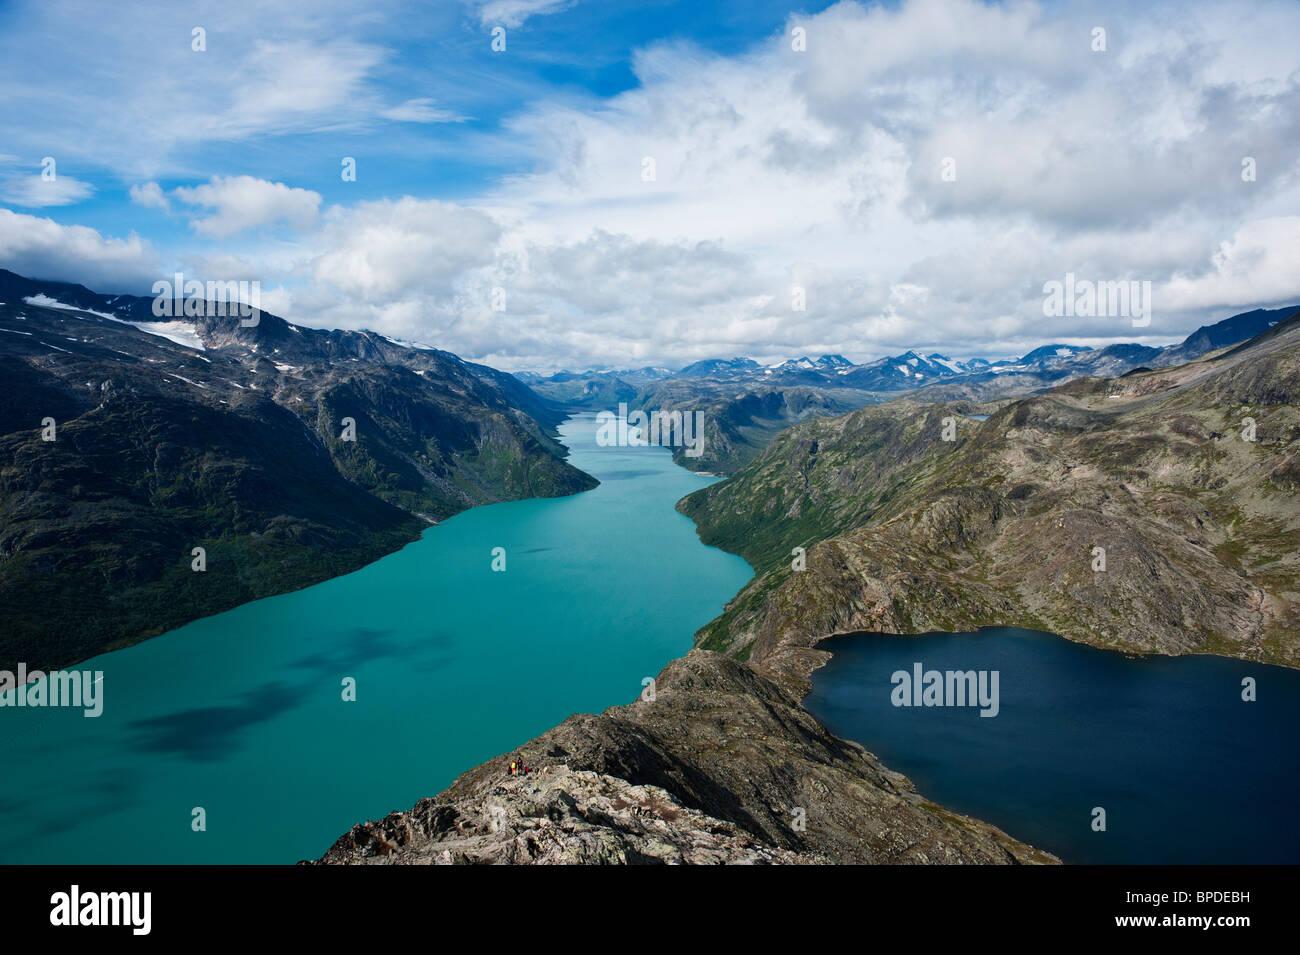 Lake Gjende viewed from Besseggen ridge, Jotunheimen national park, Norway - Stock Image